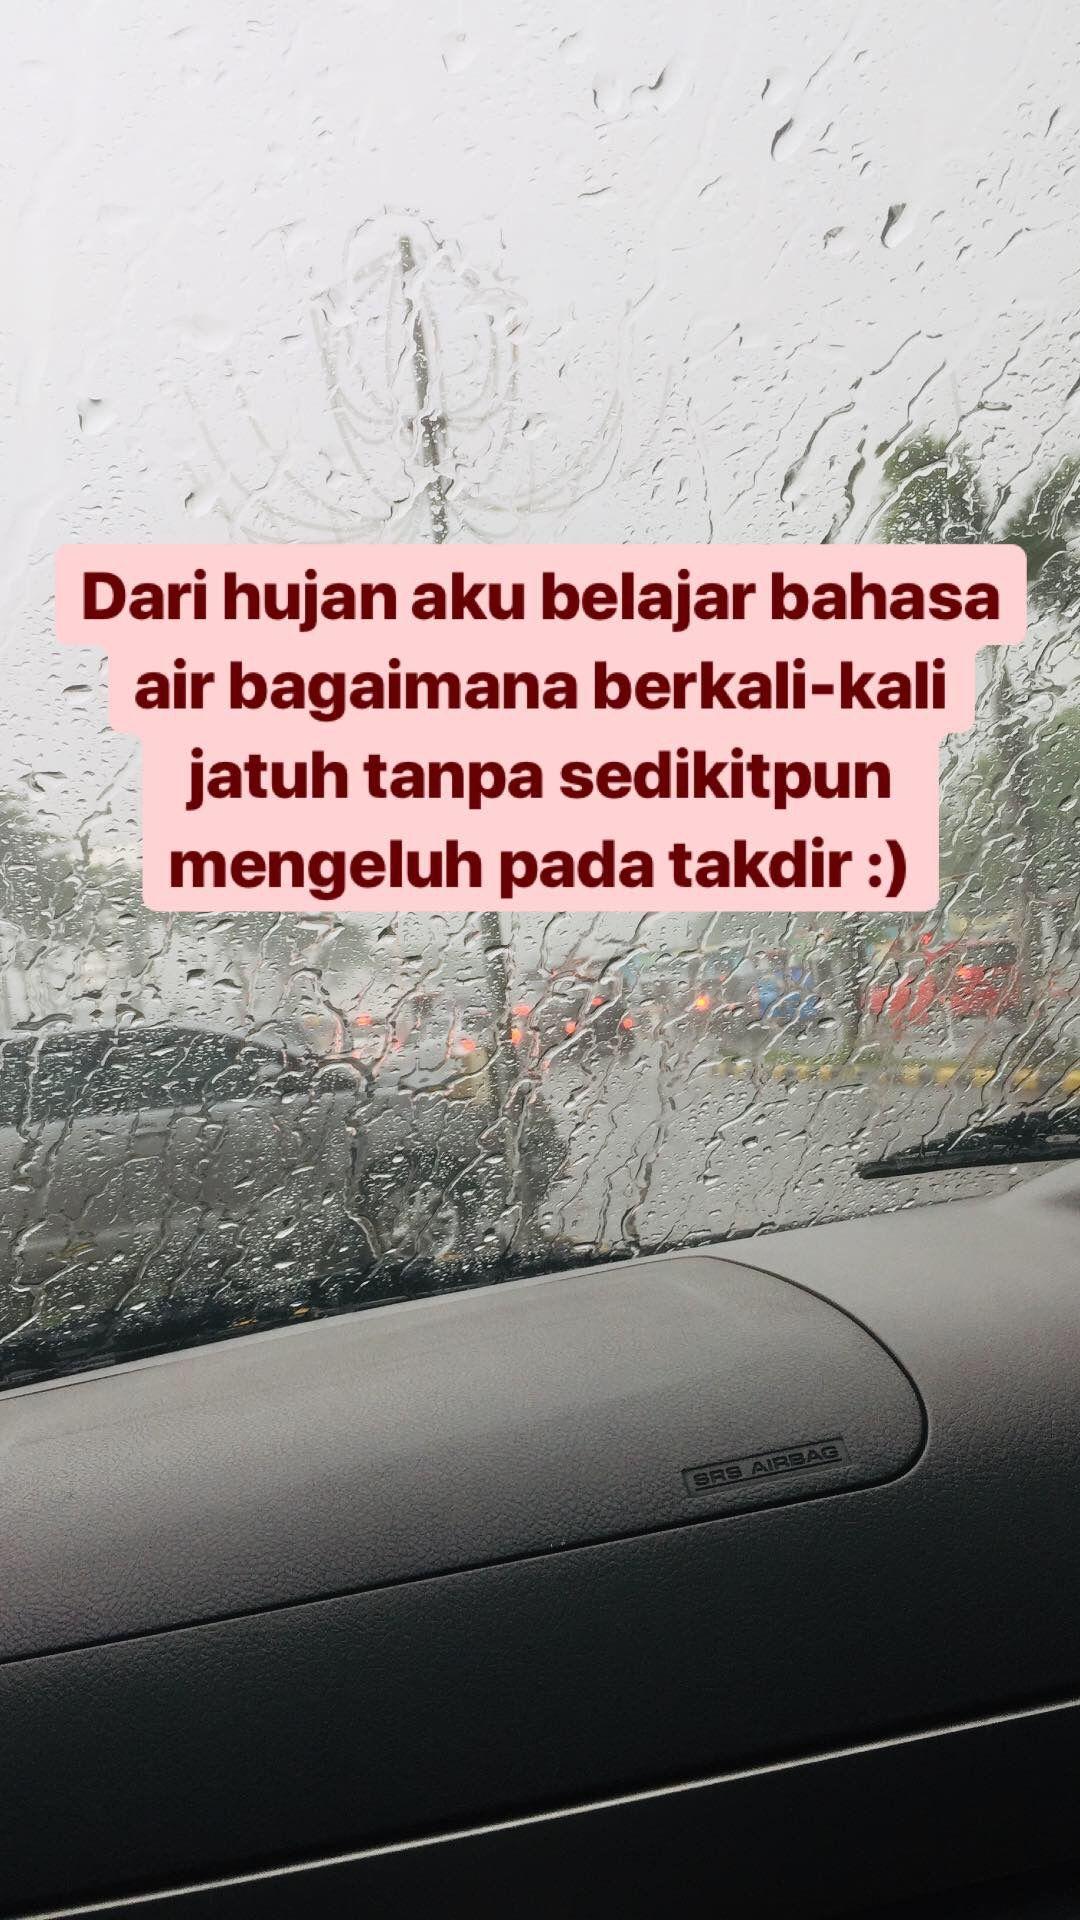 Hujan Yang Indah Kali Ini Created By Ig Tasyarns Hari Hujan